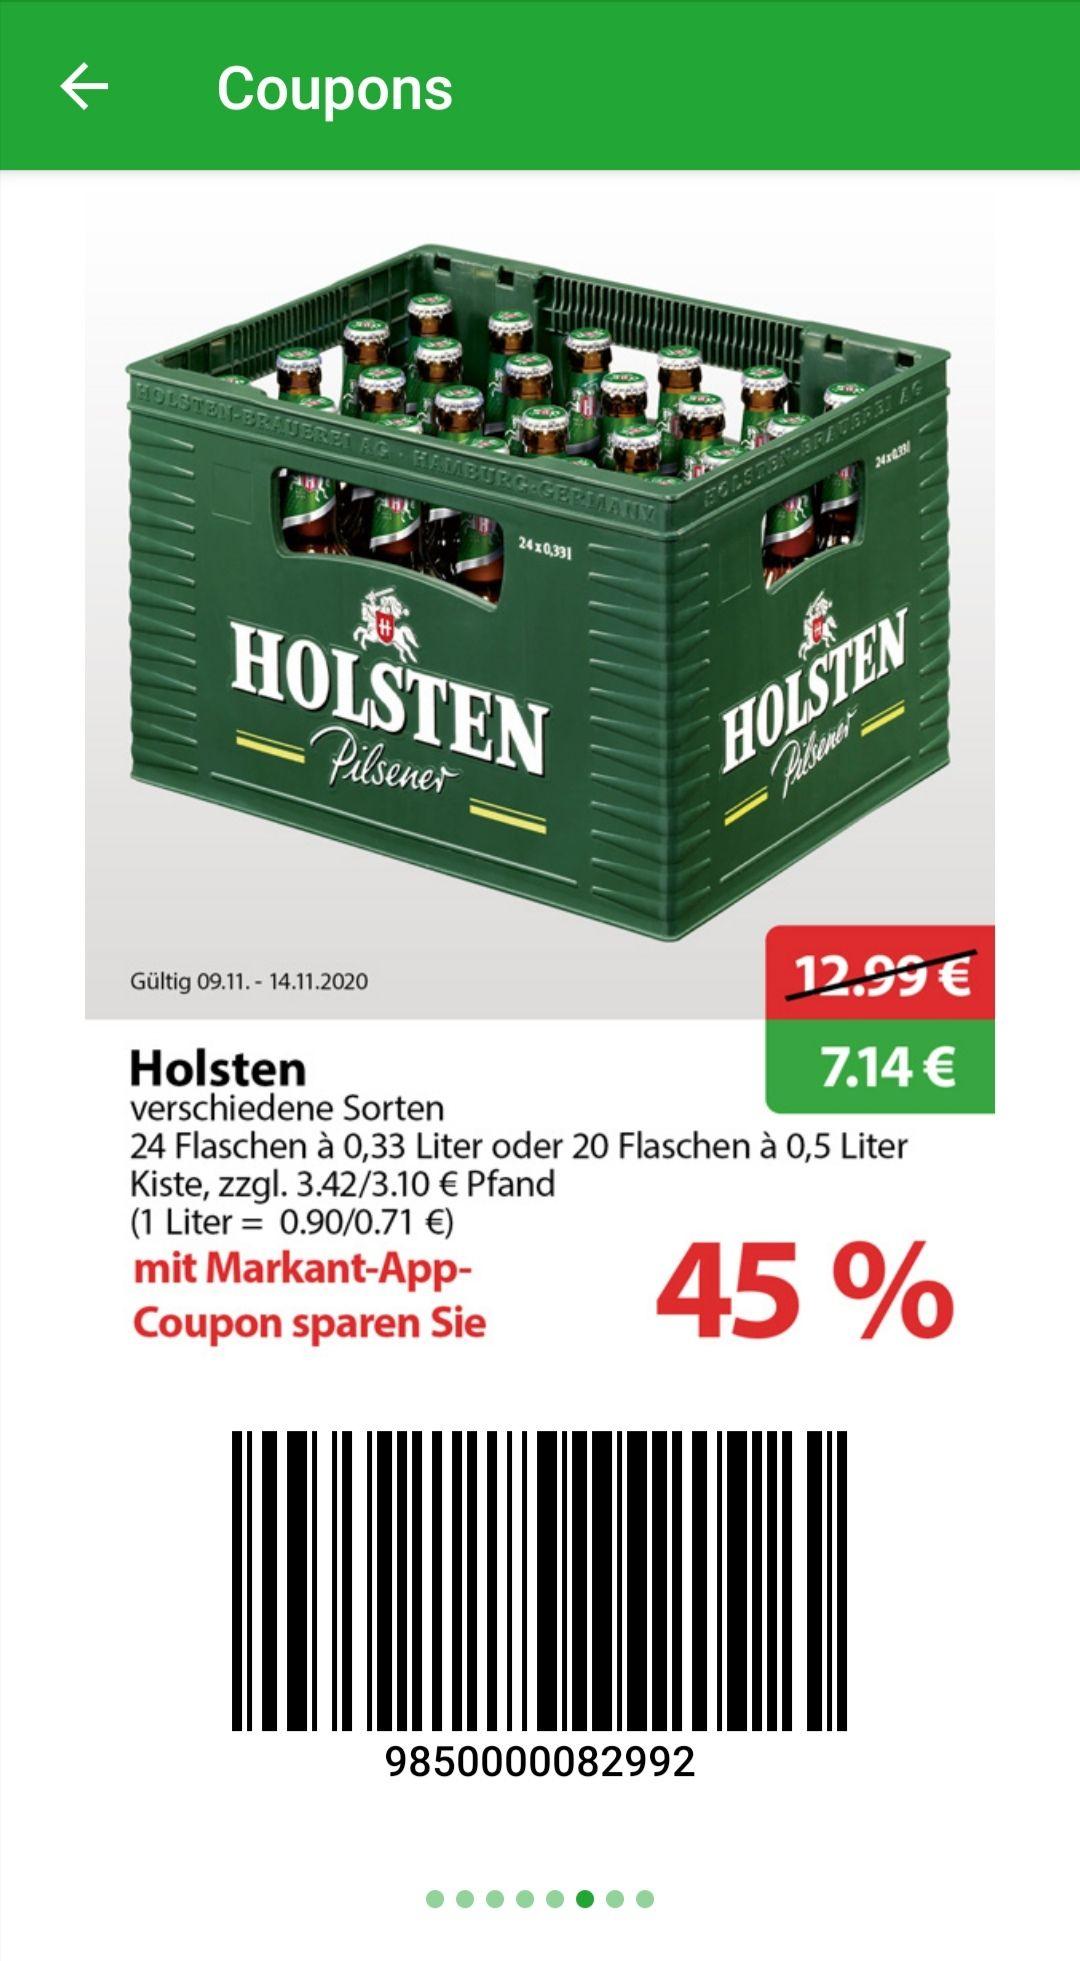 [Markant] Holsten Flaschenbier 0,33l oder 0,5l